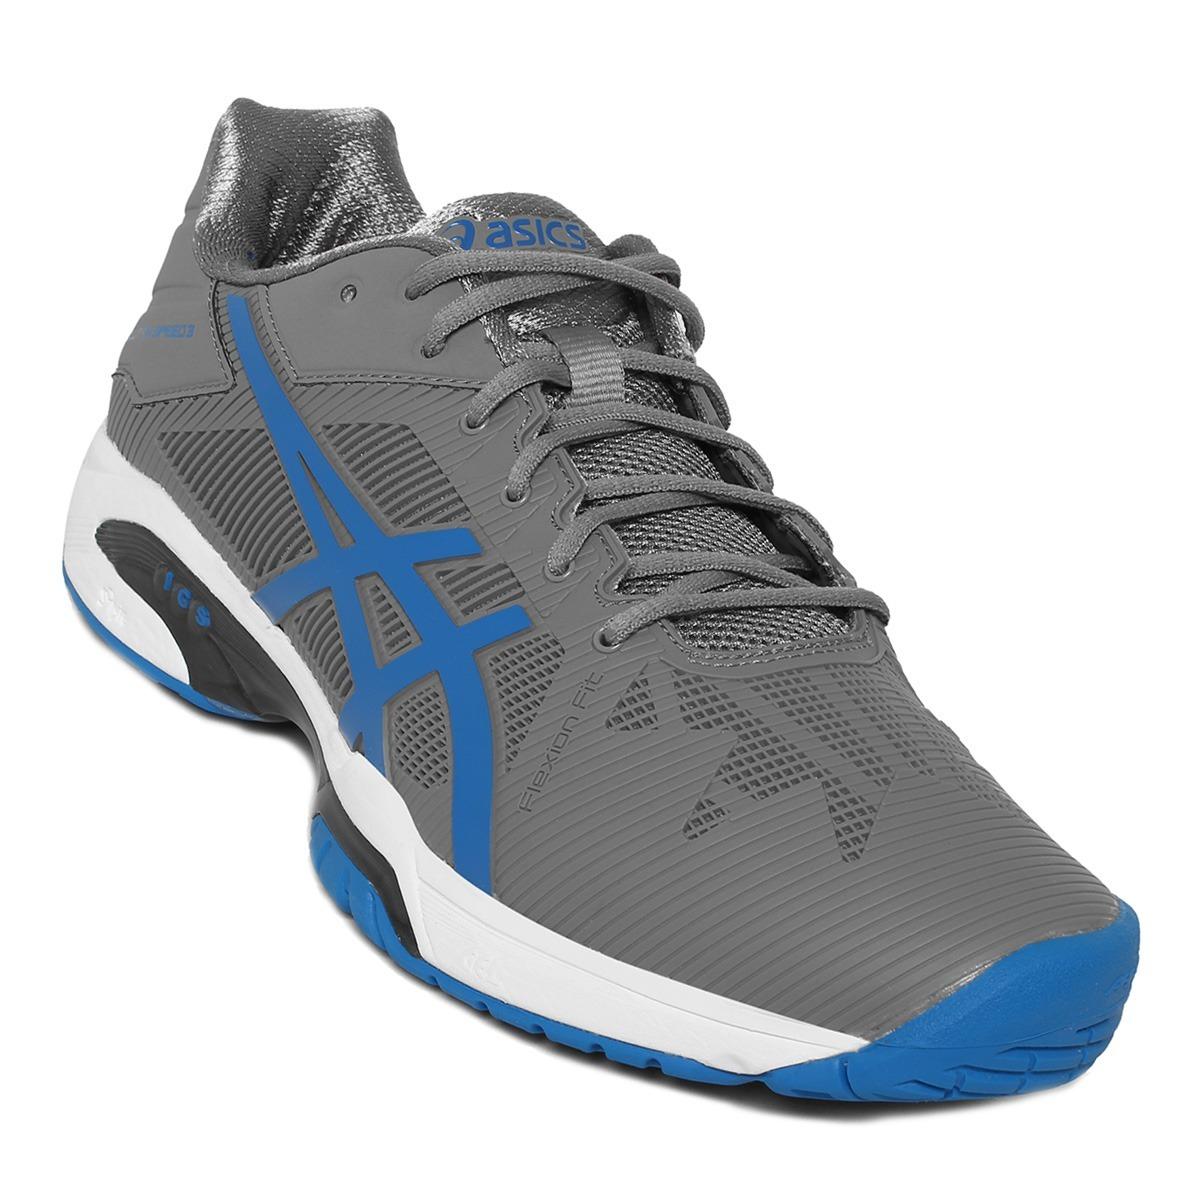 43d1eb462155c tenis asics gel-solution speed 3 - gris y azul. Cargando zoom.